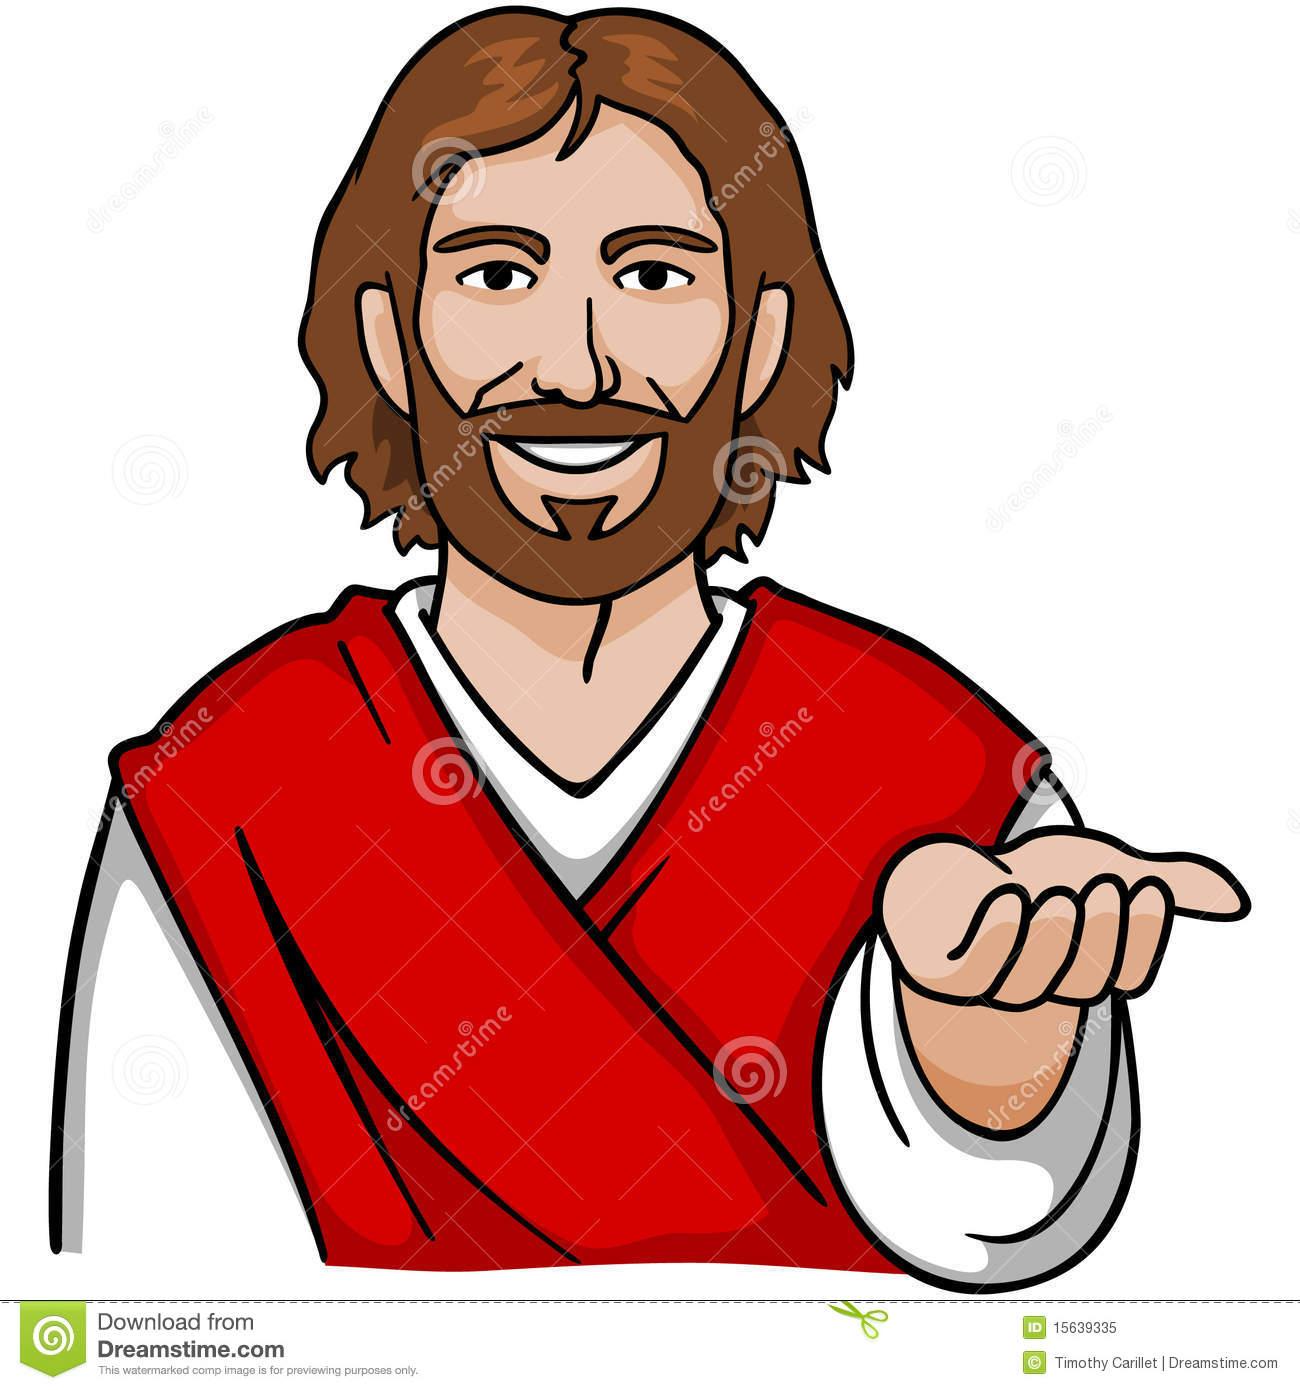 hight resolution of jesus clip art resolution 1300x1390